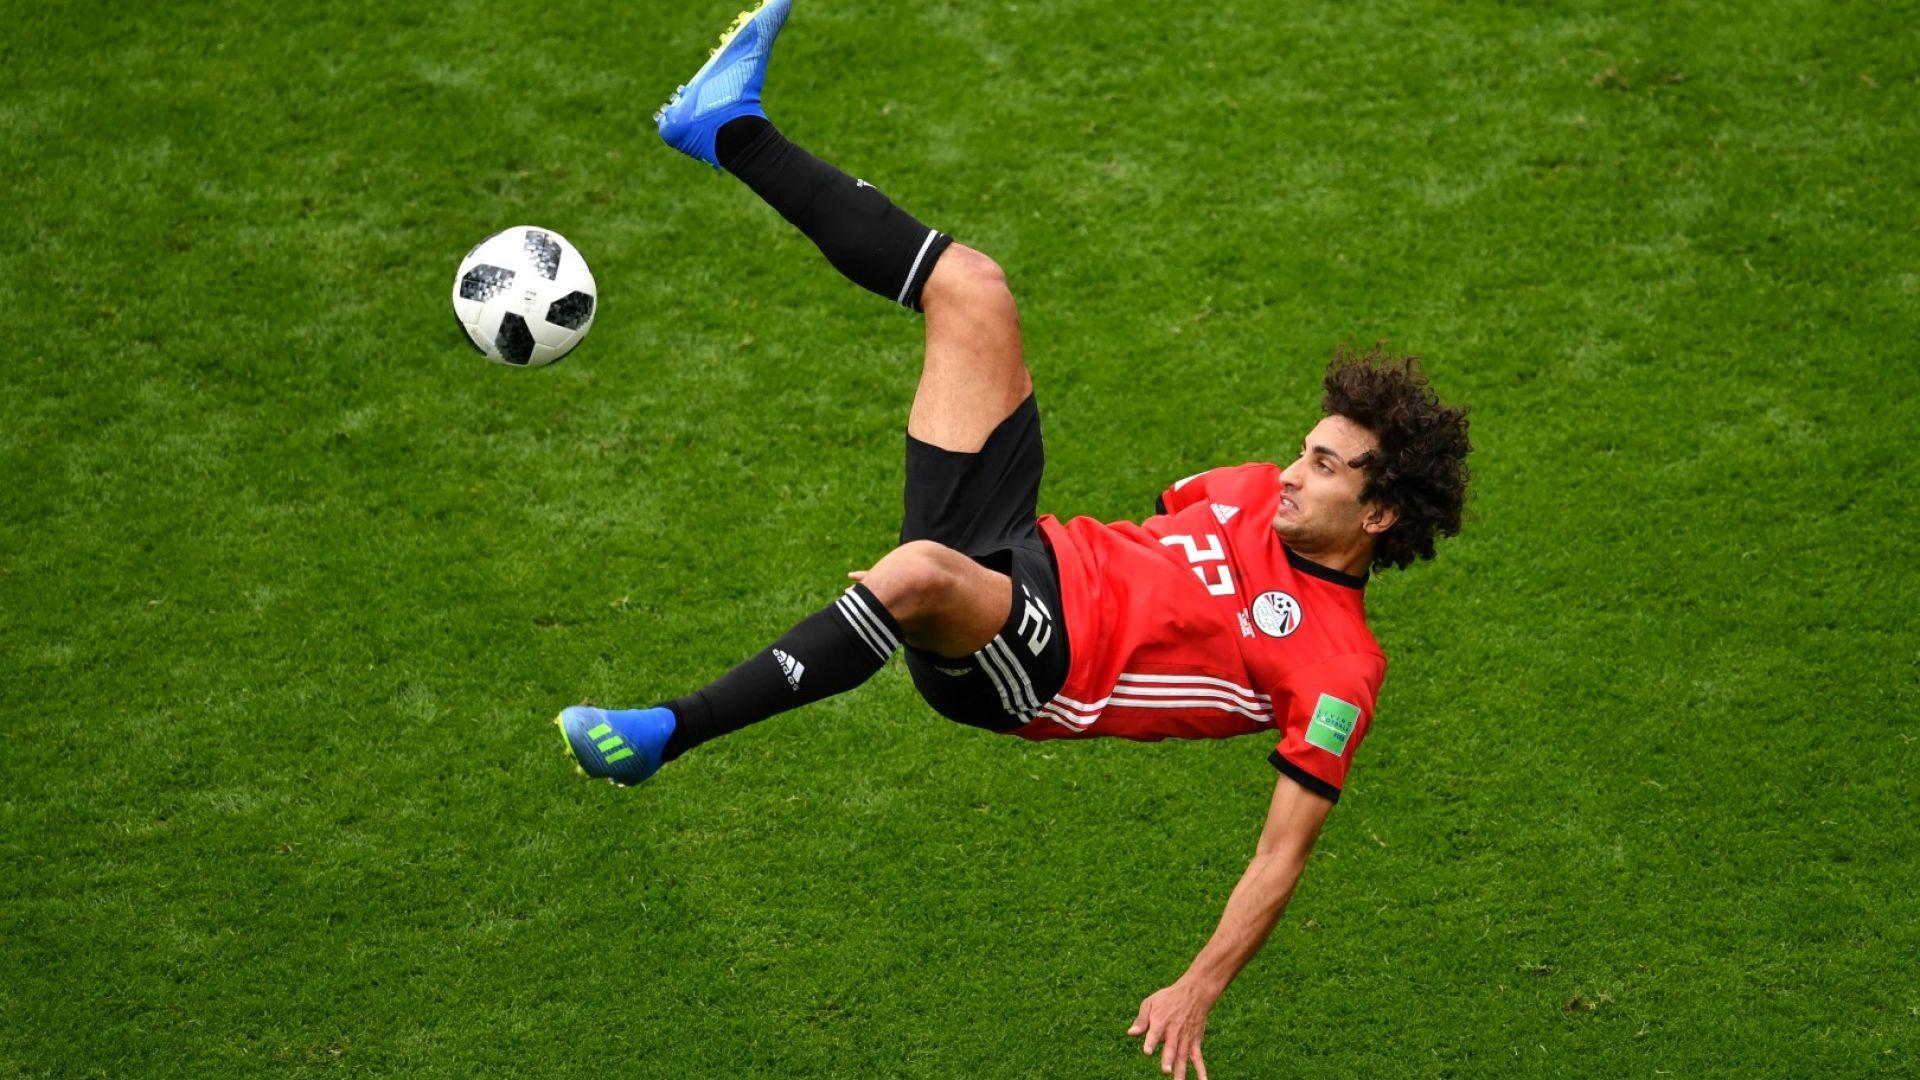 Египет - Уругвай 0:1 (виж статистиките)